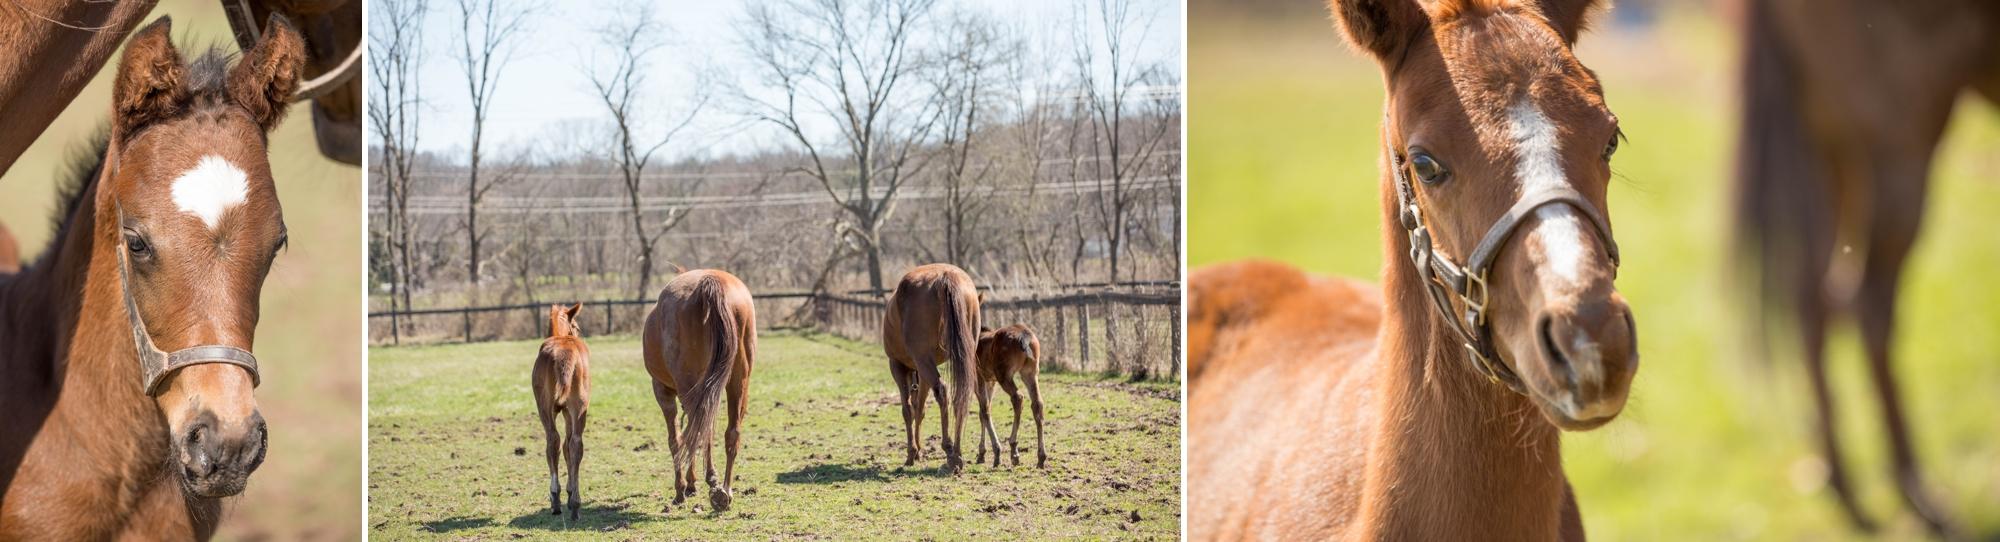 Foals 6.jpg